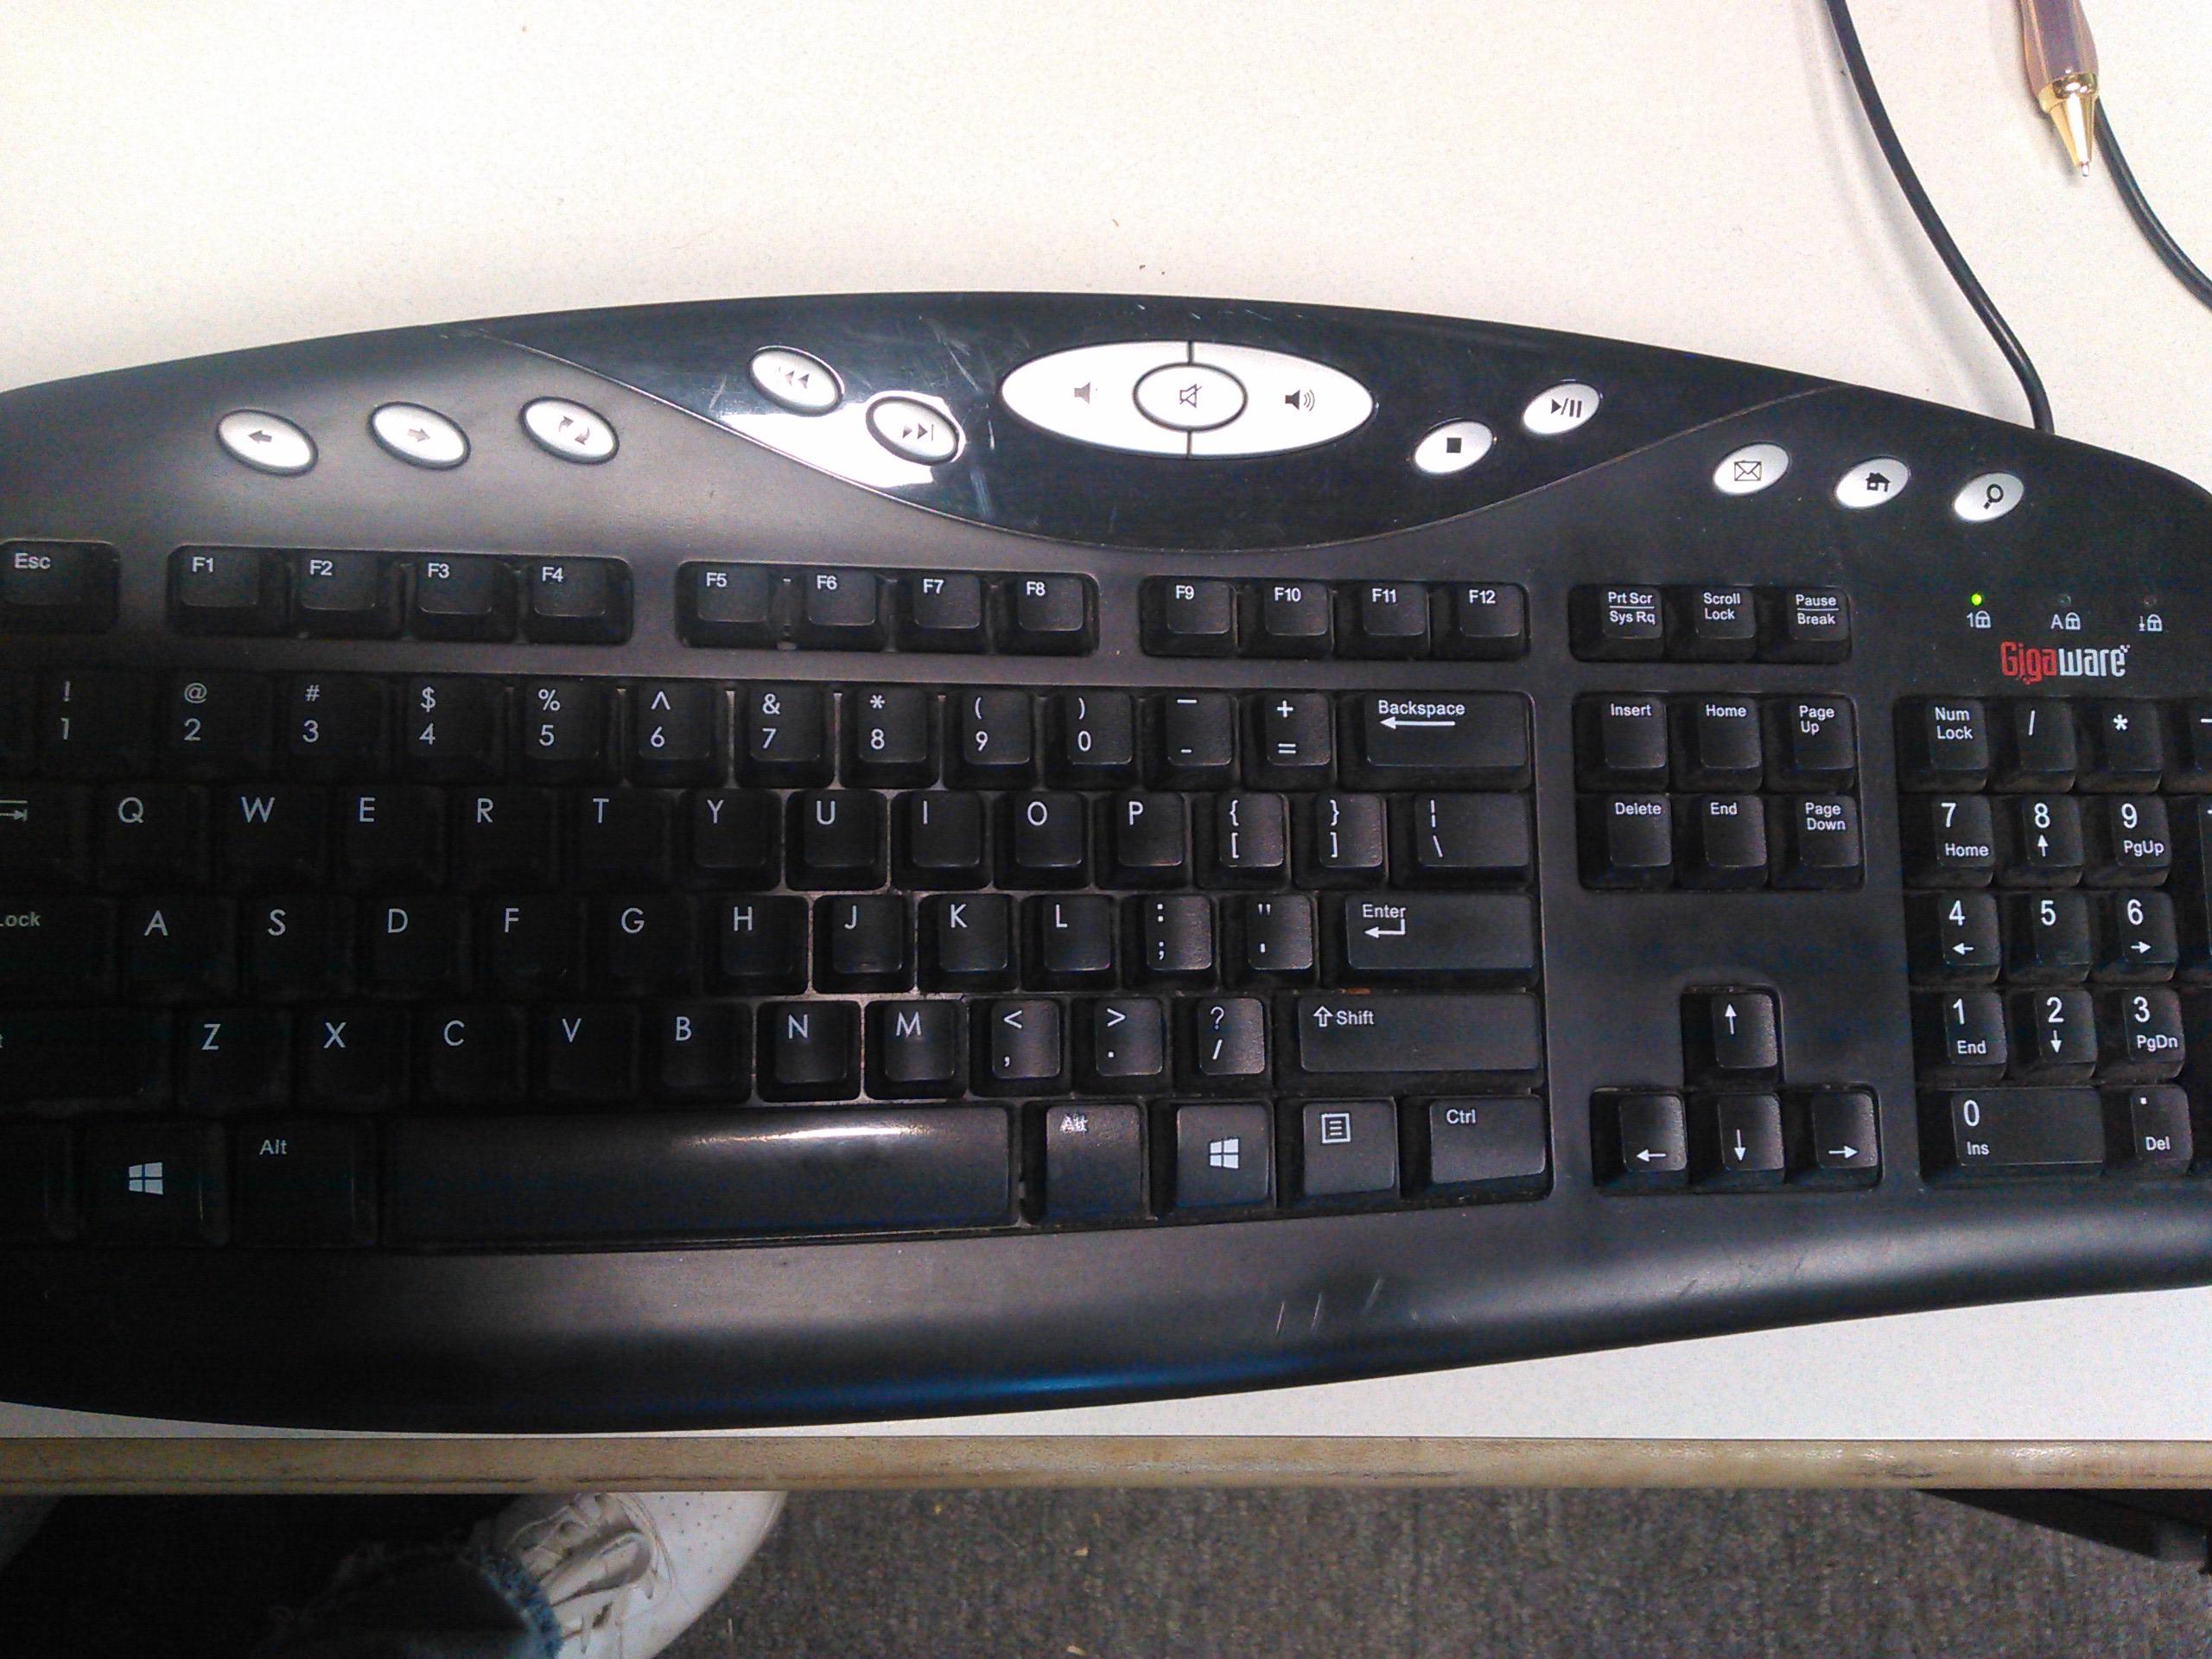 Making the GigaWare 2600460 Keyboard Work With Ubuntu 20.04 LTS